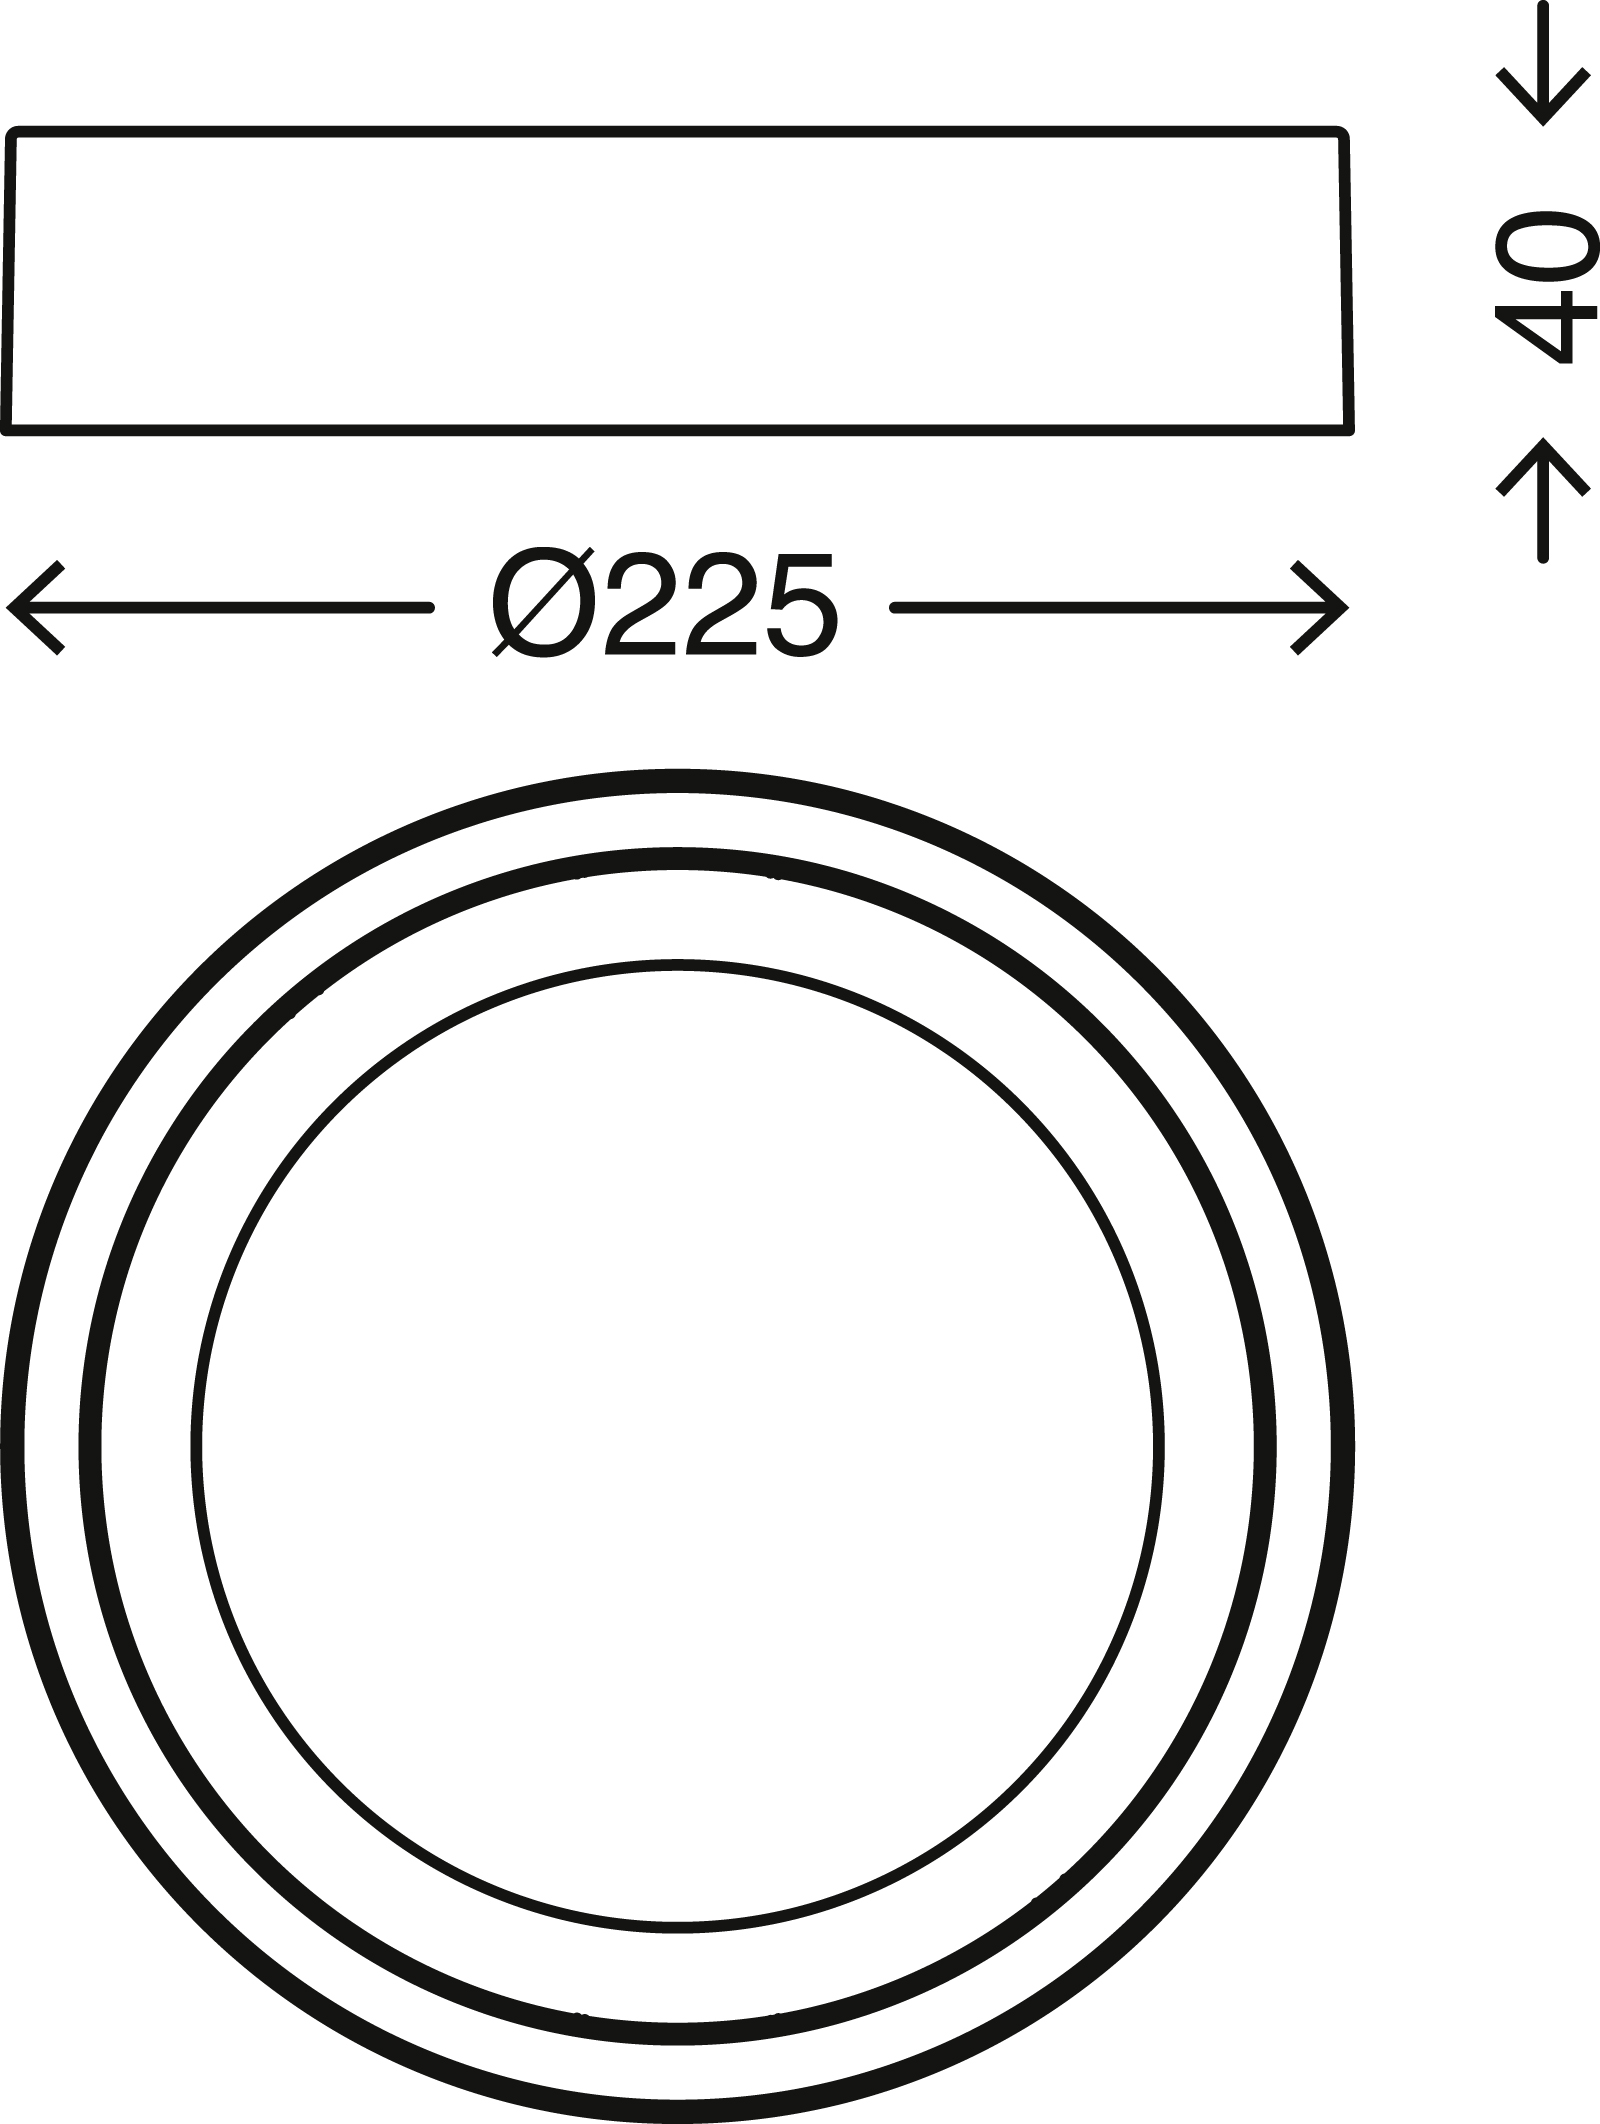 LED Deckenleuchte, Ø 22,5 cm, 16,5 W, Chrom-Matt